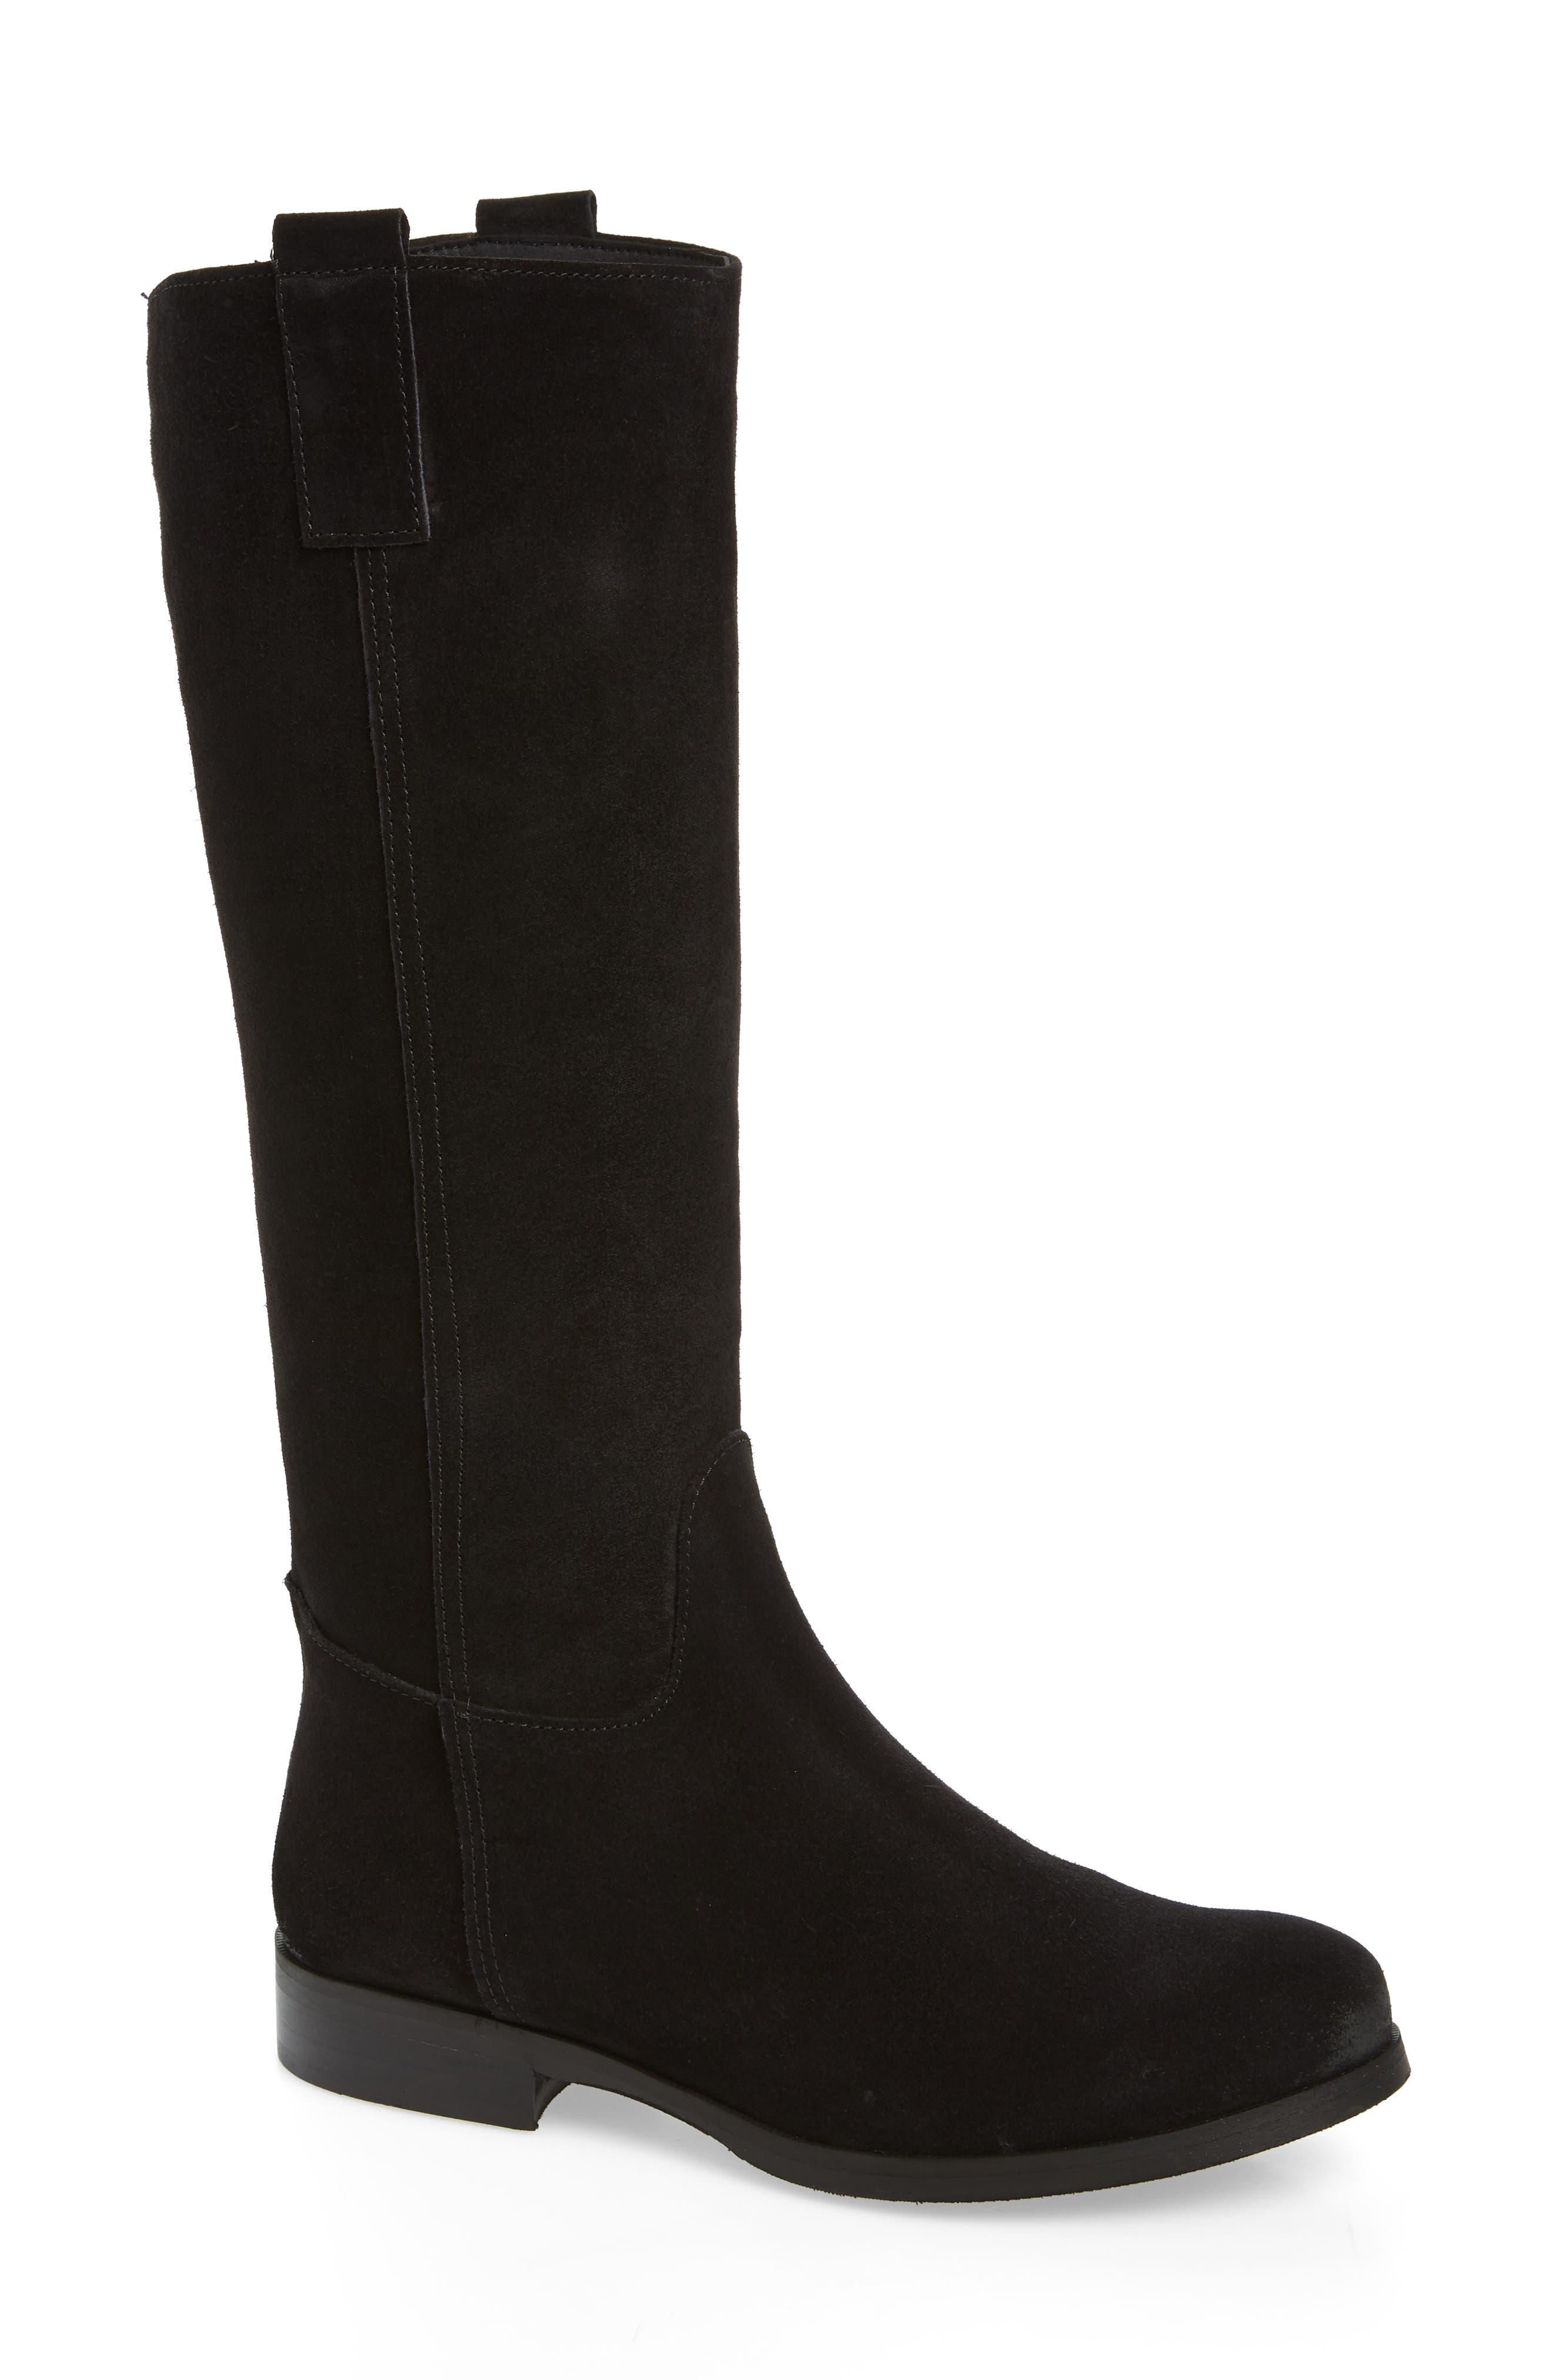 Cordani Benji Knee High Boot - Black